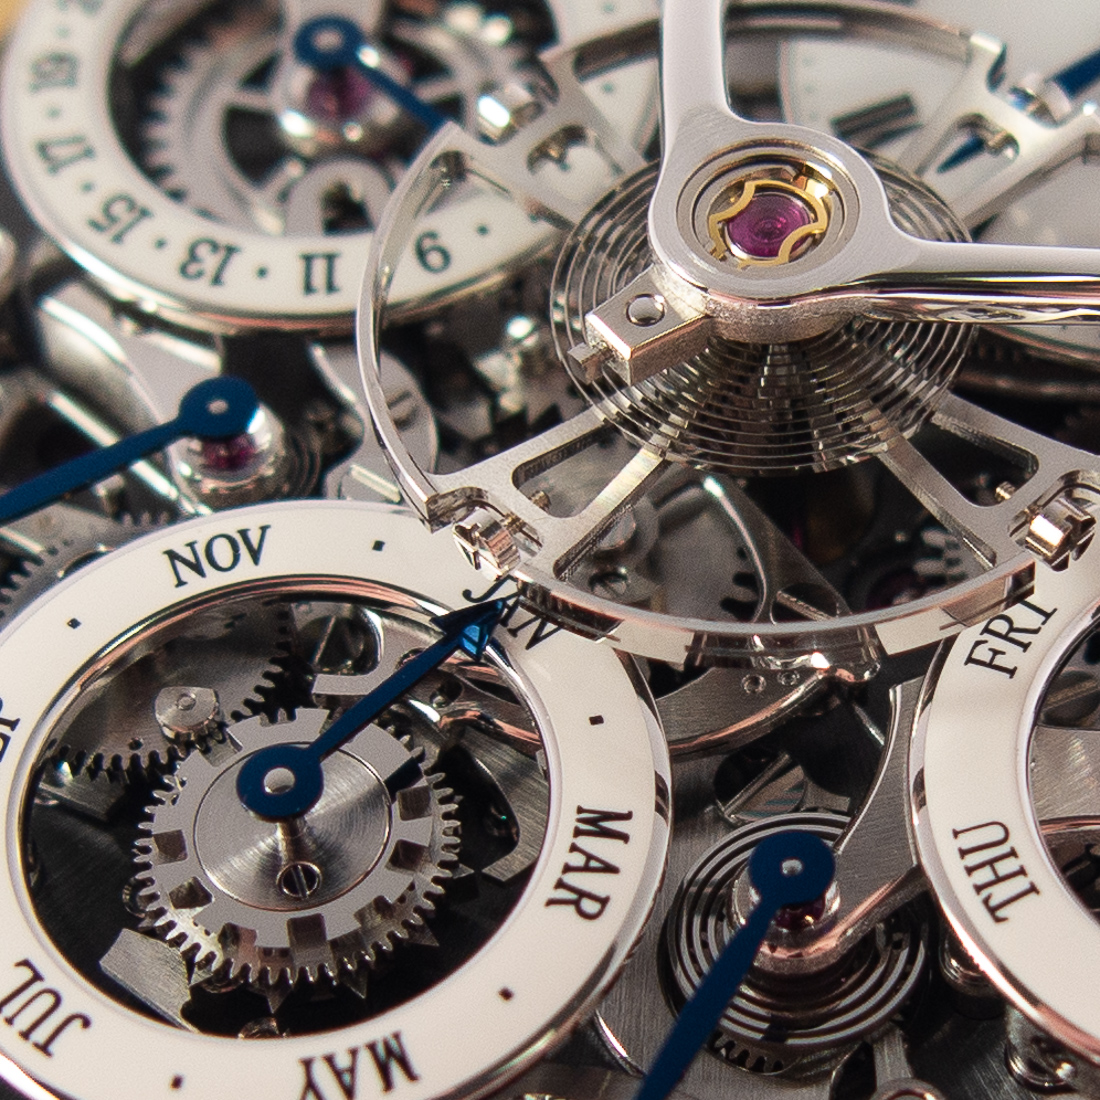 The balance oscillating above subsidiary calendar dials